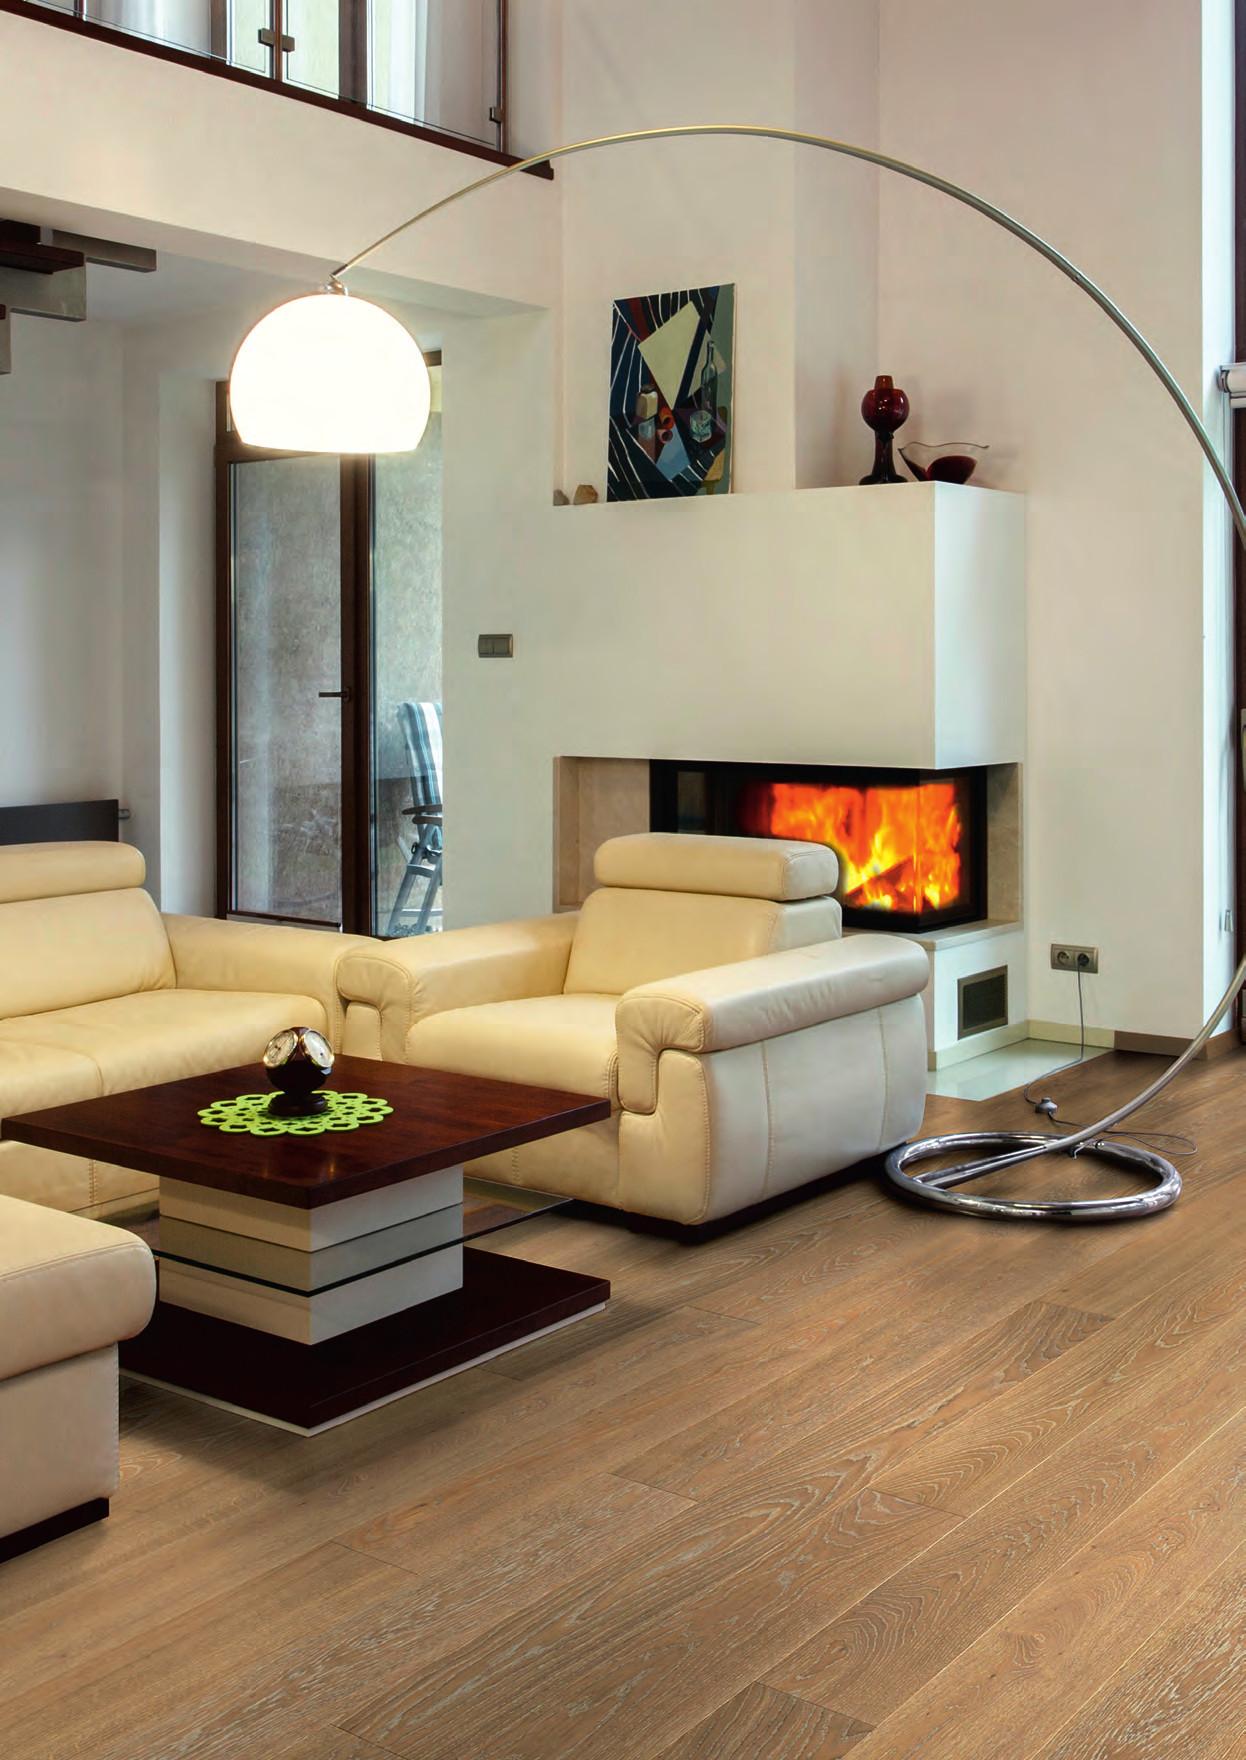 hardwood floor knot filler of brooks bros for hardwood flooring 2016 17 price list pdf regarding spirit